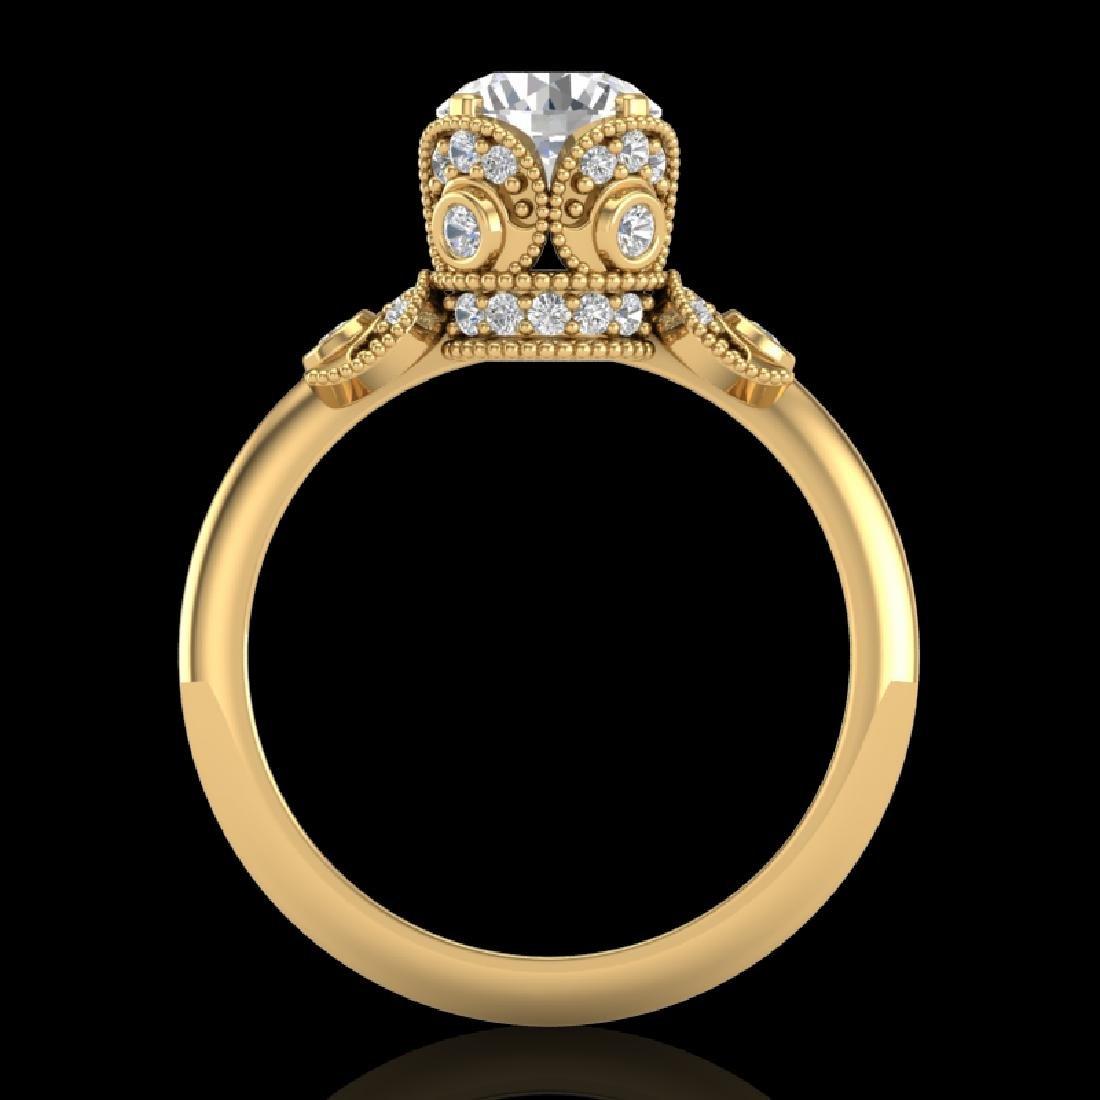 1.75 CTW VS/SI Diamond Art Deco Ring 18K Yellow Gold - 2